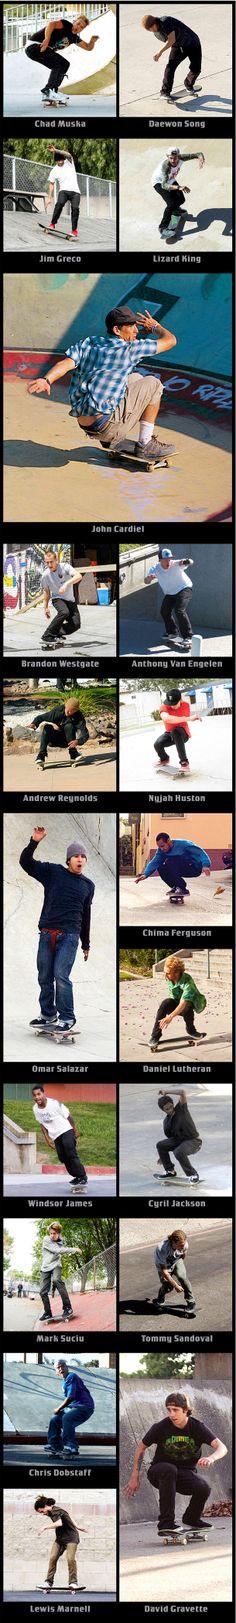 Thrasher Skateboard Magazine   The Make: A photo gallery of roll-away shots